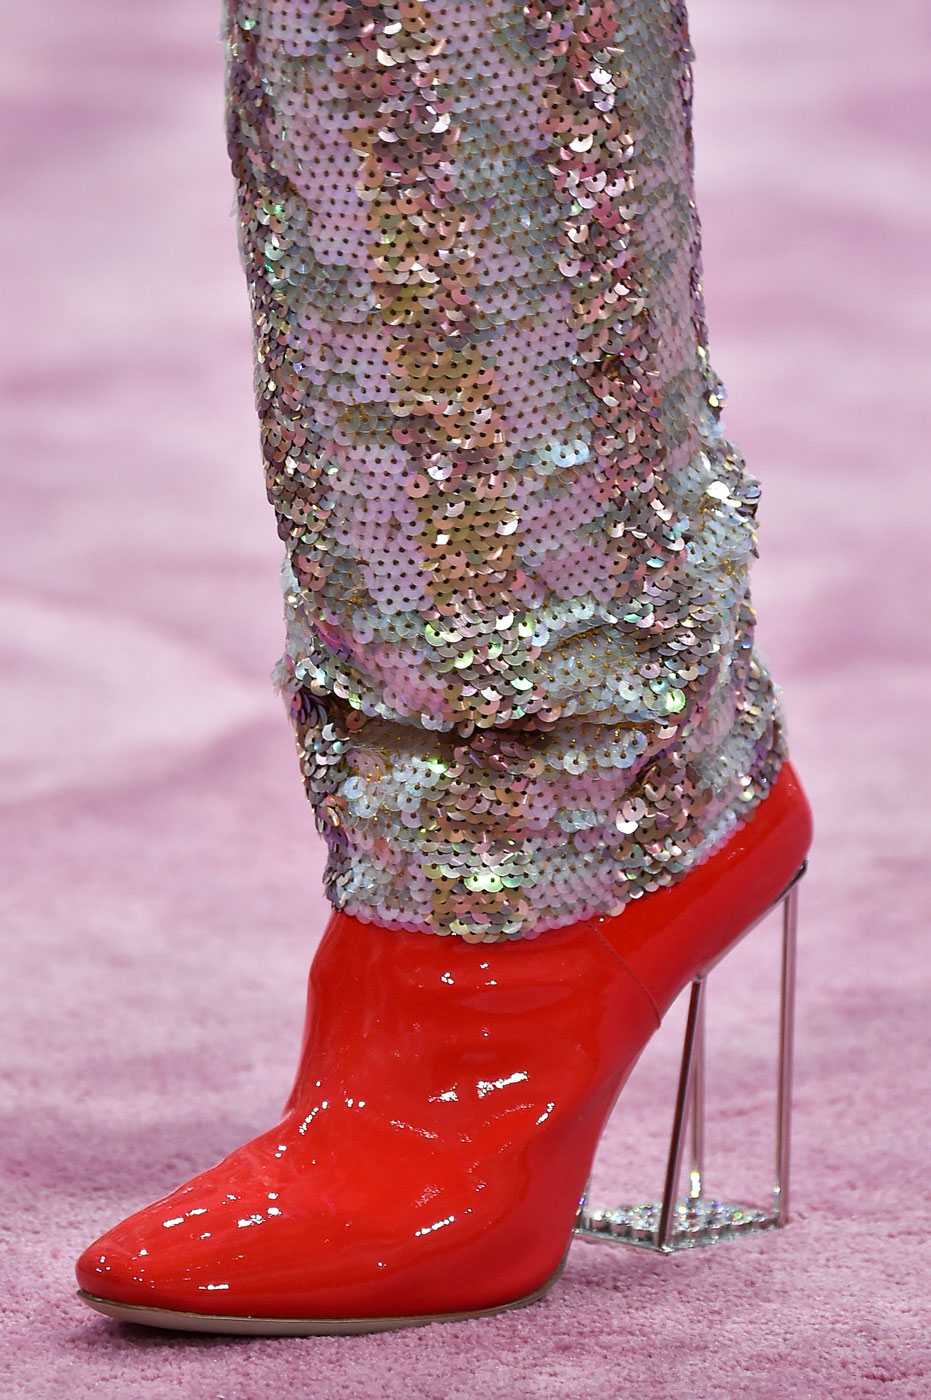 Christian-Dior-fashion-runway-show-close-ups-haute-couture-paris-spring-summer-2015-the-impression-171